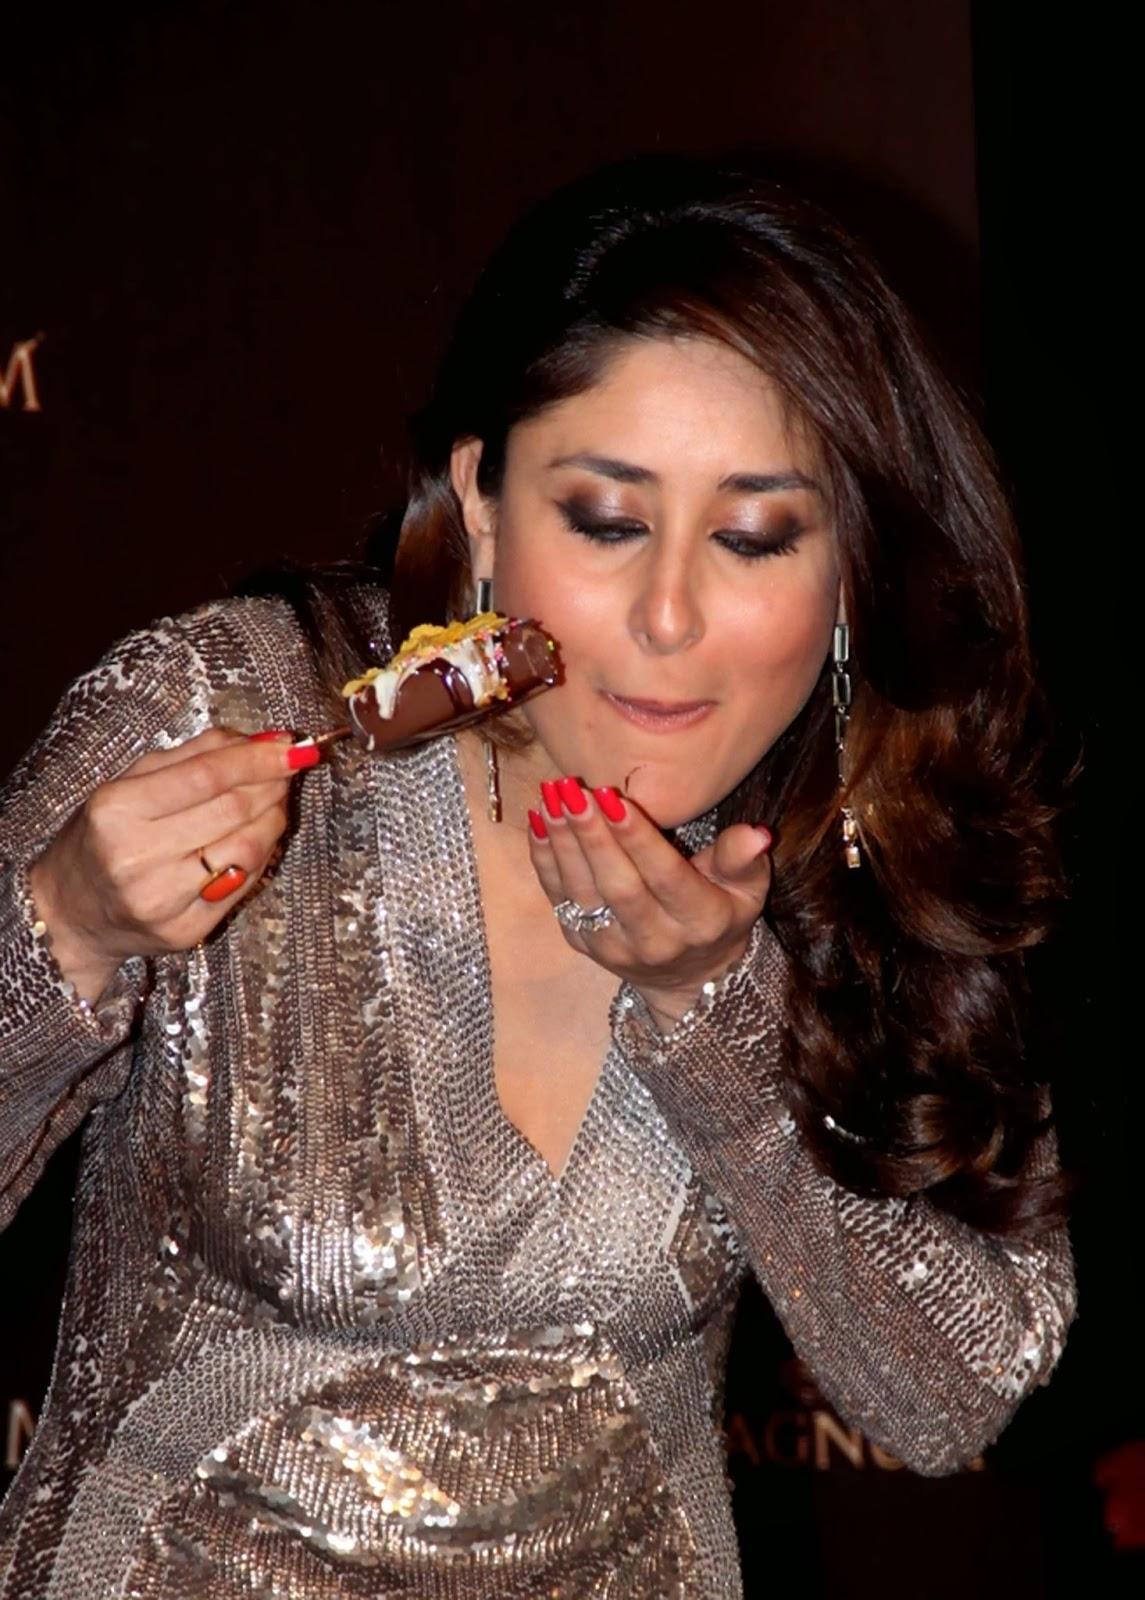 Actress, Ambassador, Bollywood, Business, Chocolate, Economy, Entertainment, Film, Ice cream, India, Kareena Kapoor, Magnum, Magnum classic, Movie, News, Showbiz,